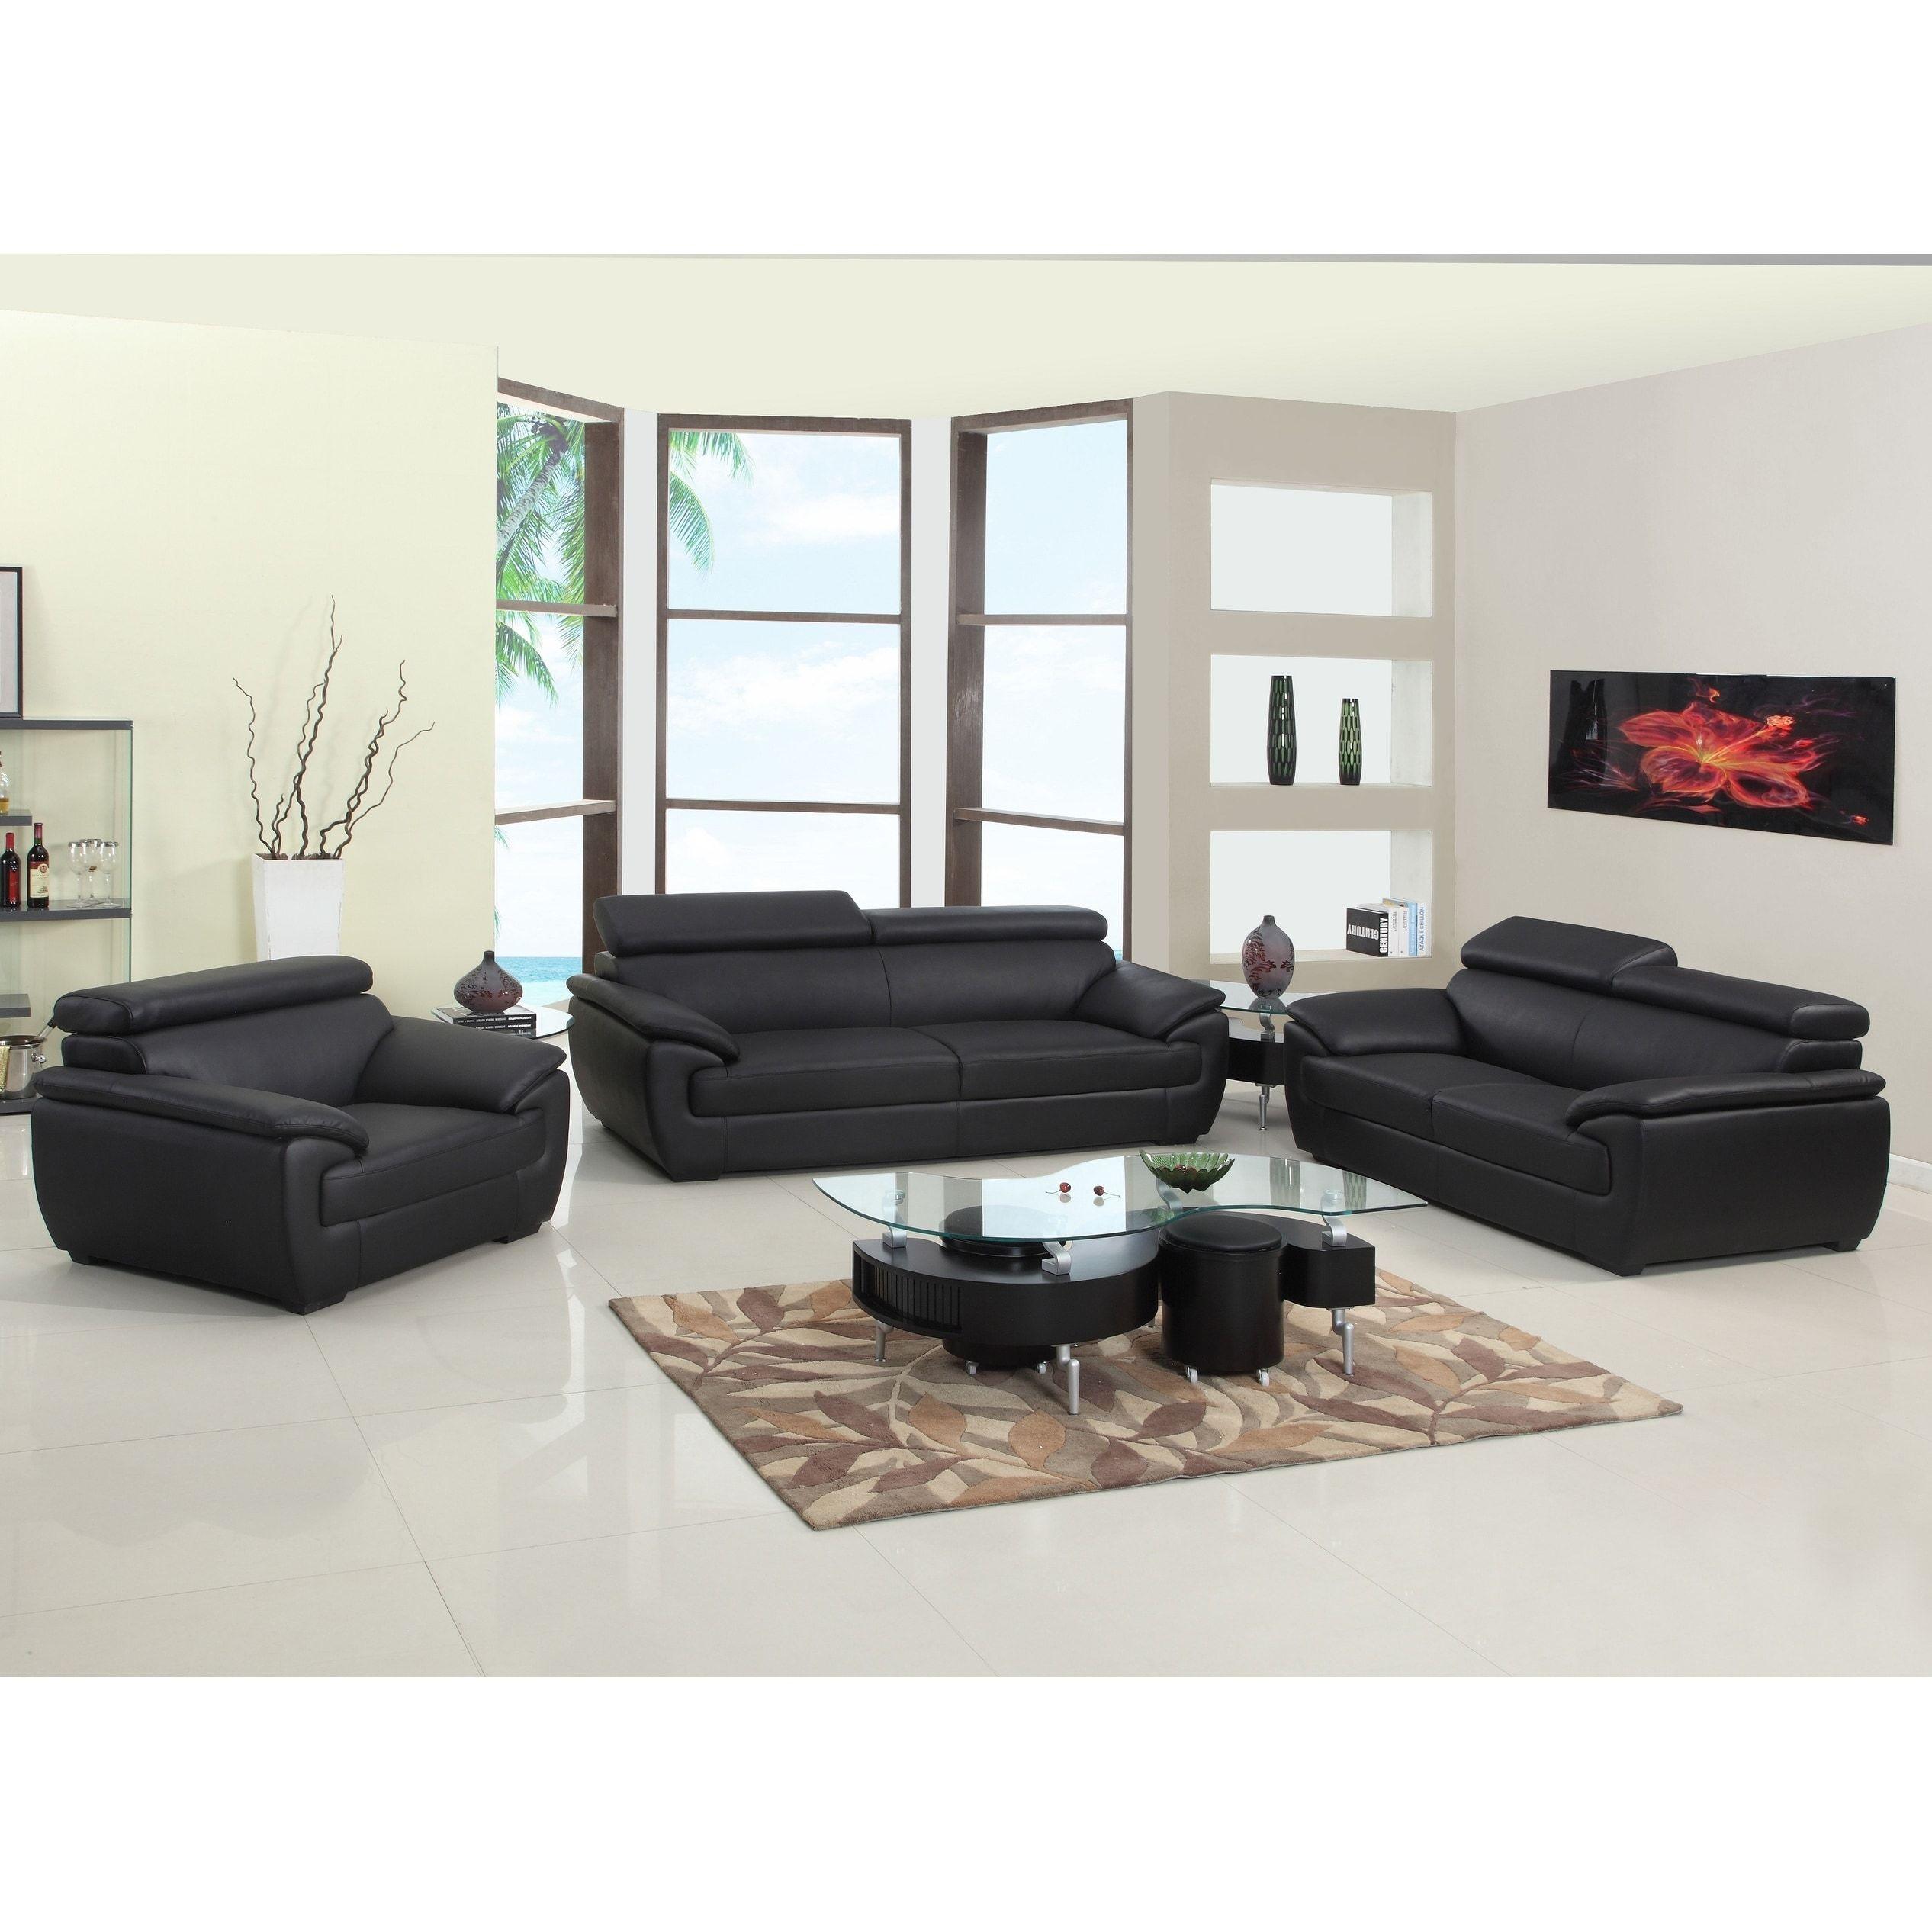 GU Furniture Leather/Match Upholstered 3-Piece Living Room Sofa Set ...